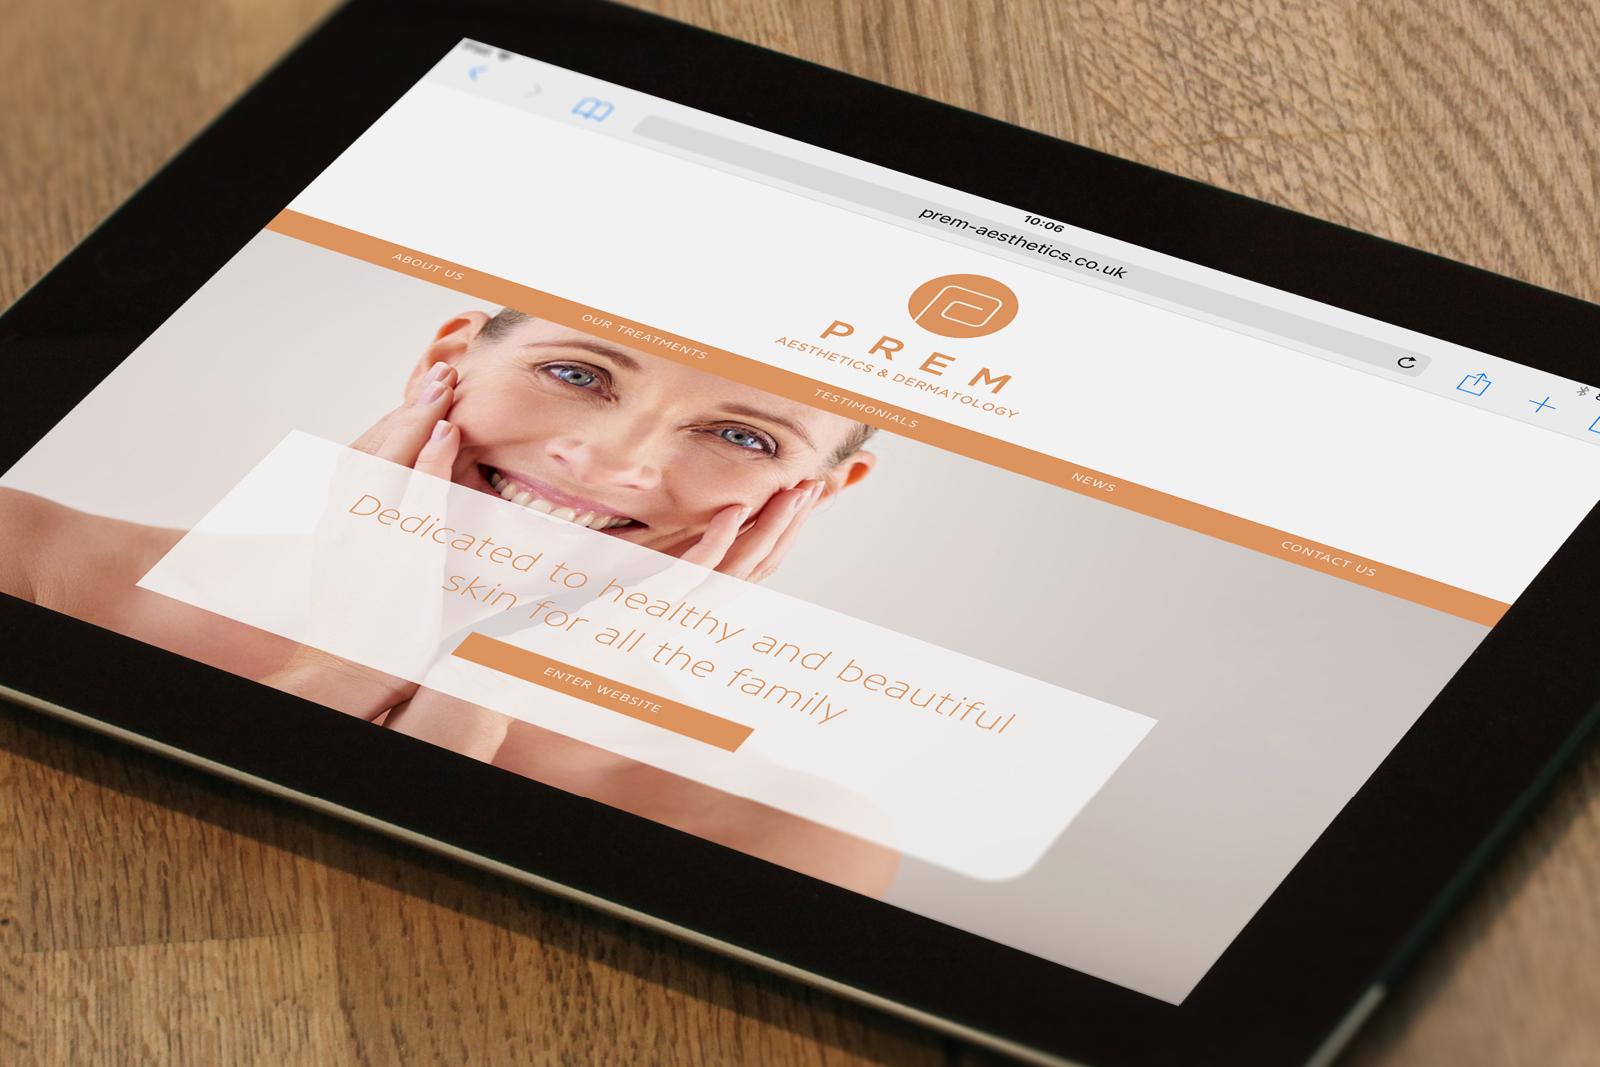 Branding and responsive website design for Prem Aesthetics, Sawbridgeworth